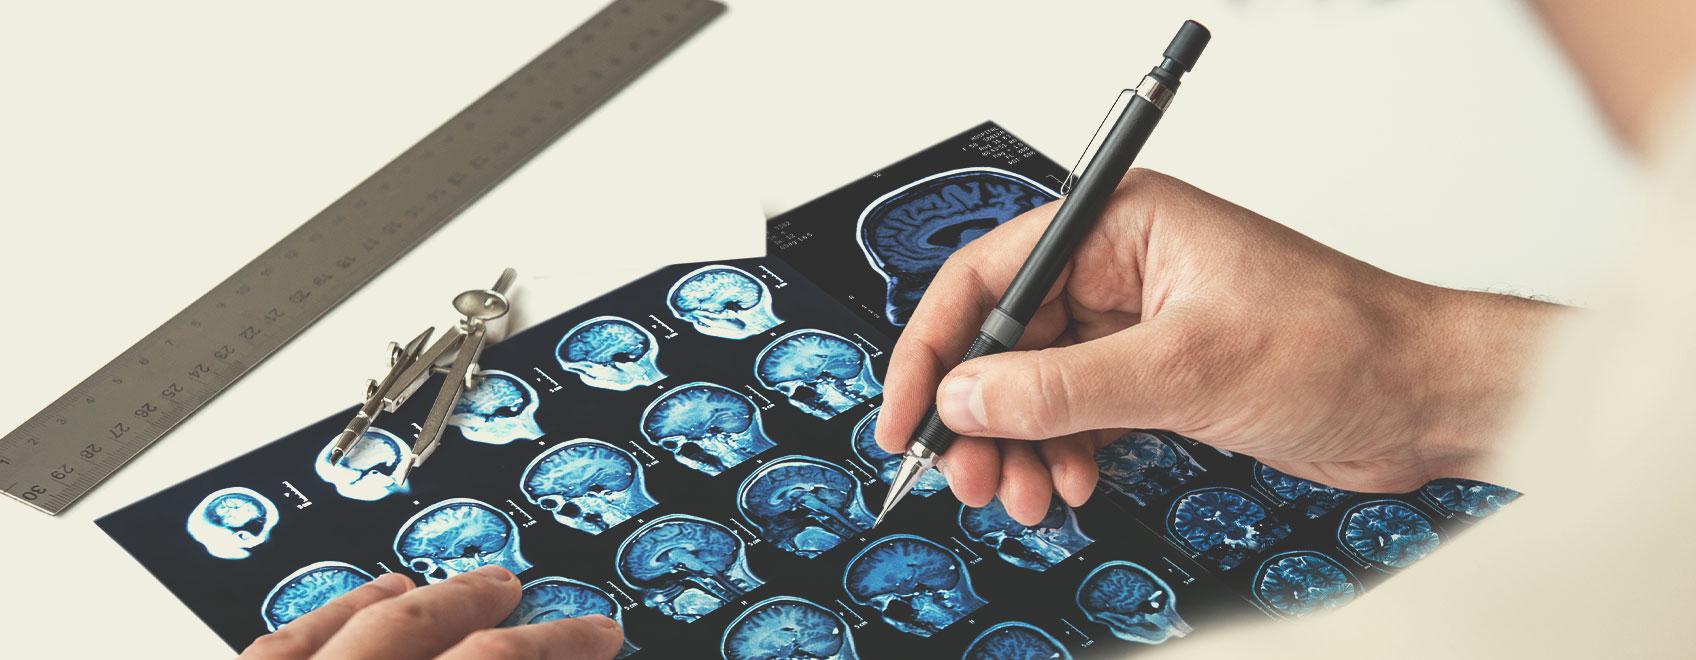 Tipi di sclerosi multipla